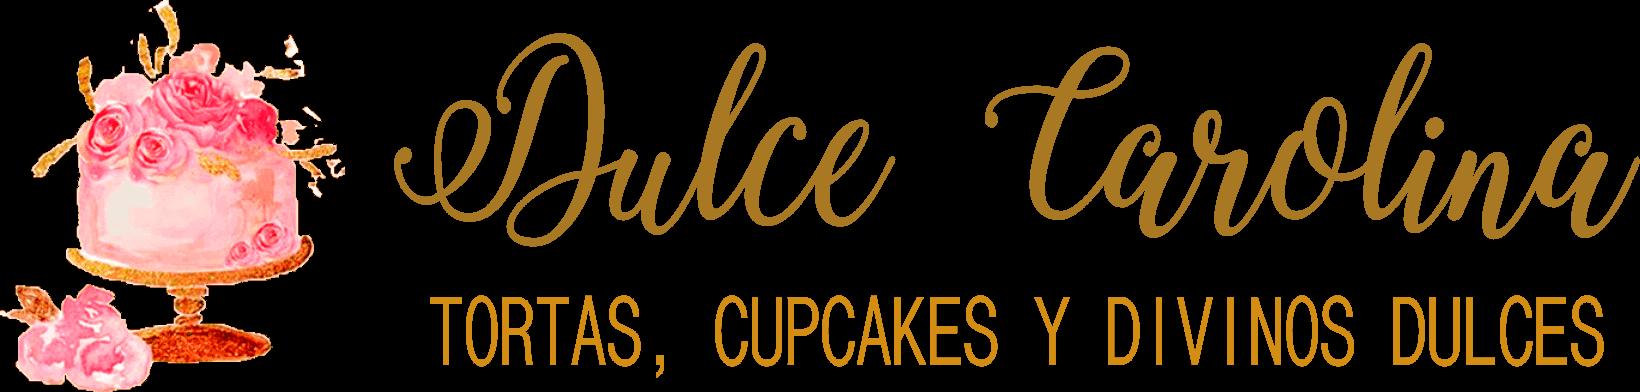 Dulce Carolina Peru Tortas, Naked Cakes, Pasteleria, Delivery en Lima.